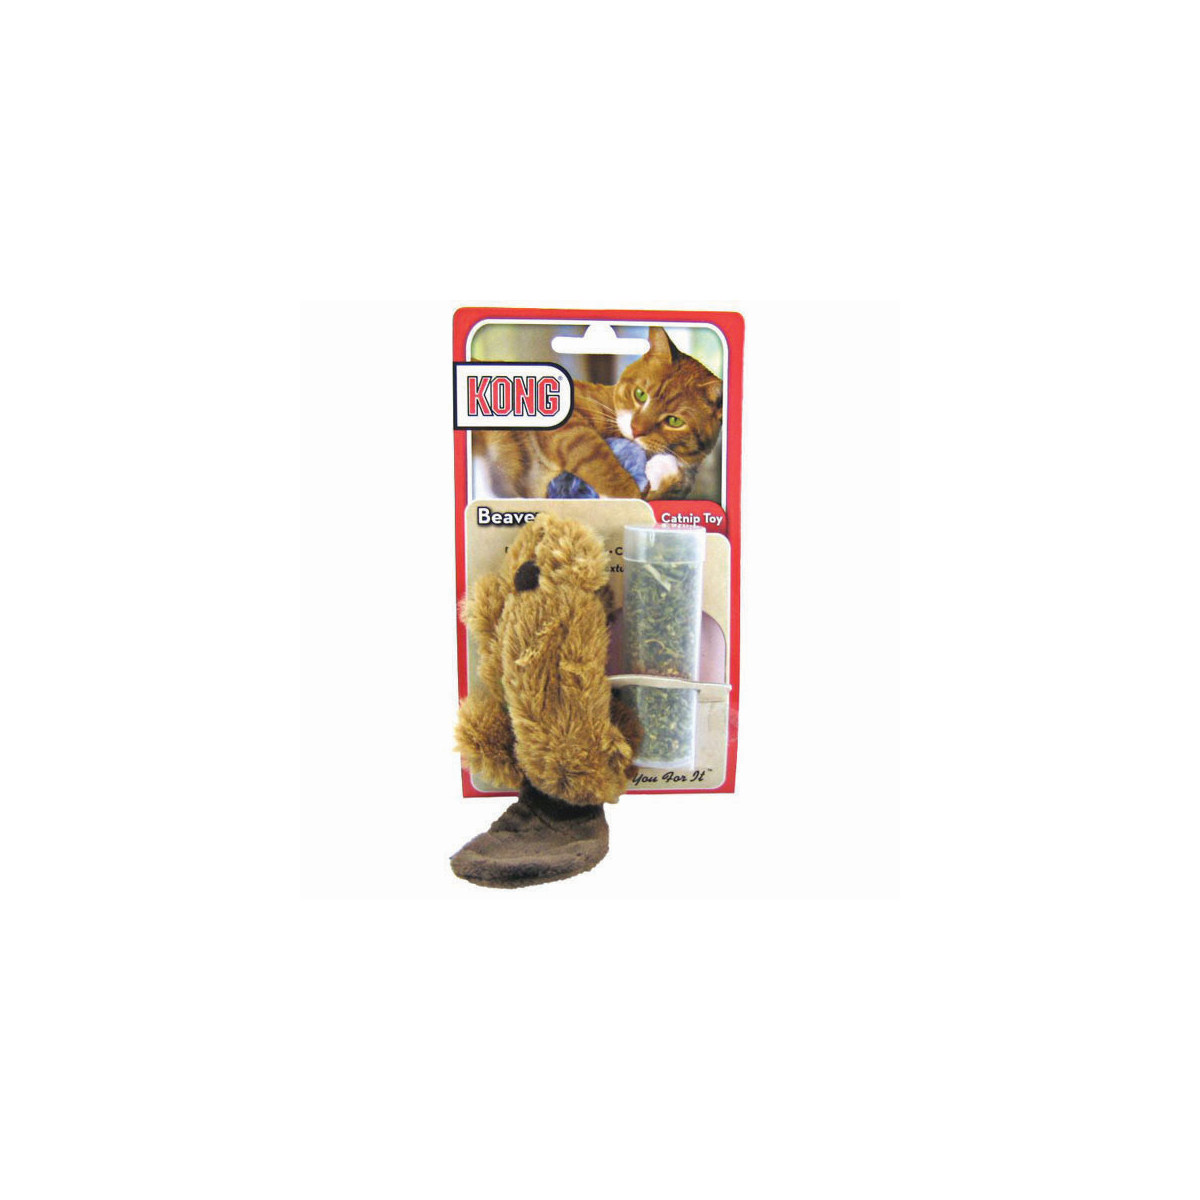 Refillable beaver bruin